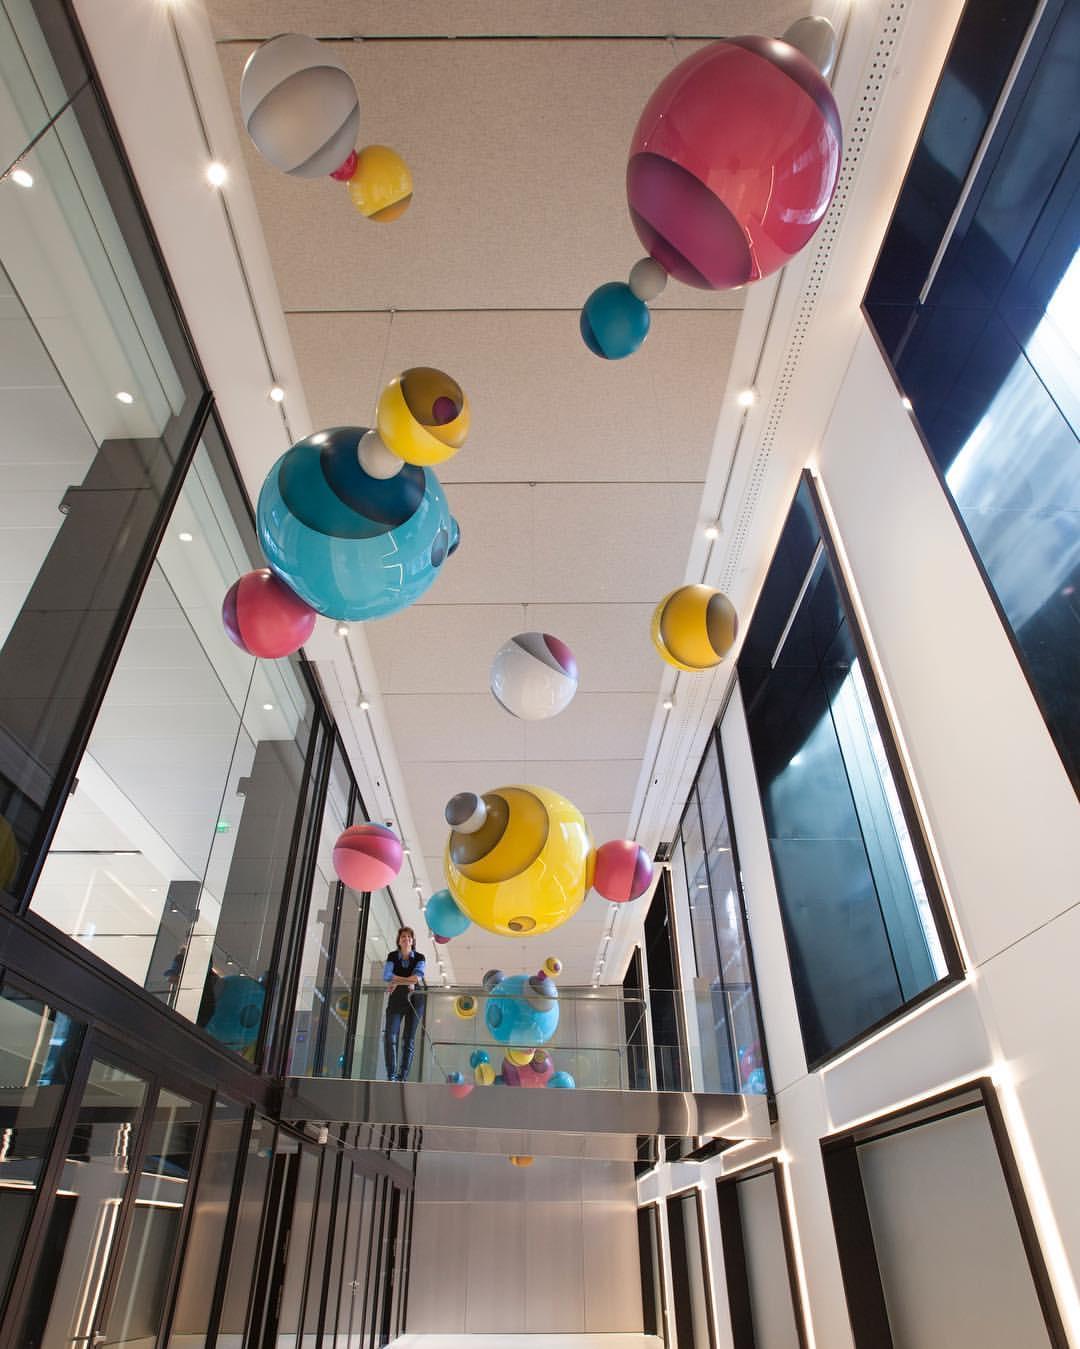 Jan Kalab, Private Cosmos, 2017 (55 rue d'Amsterdam, Paris 8, Gecina, Naud & Poux Architectes)